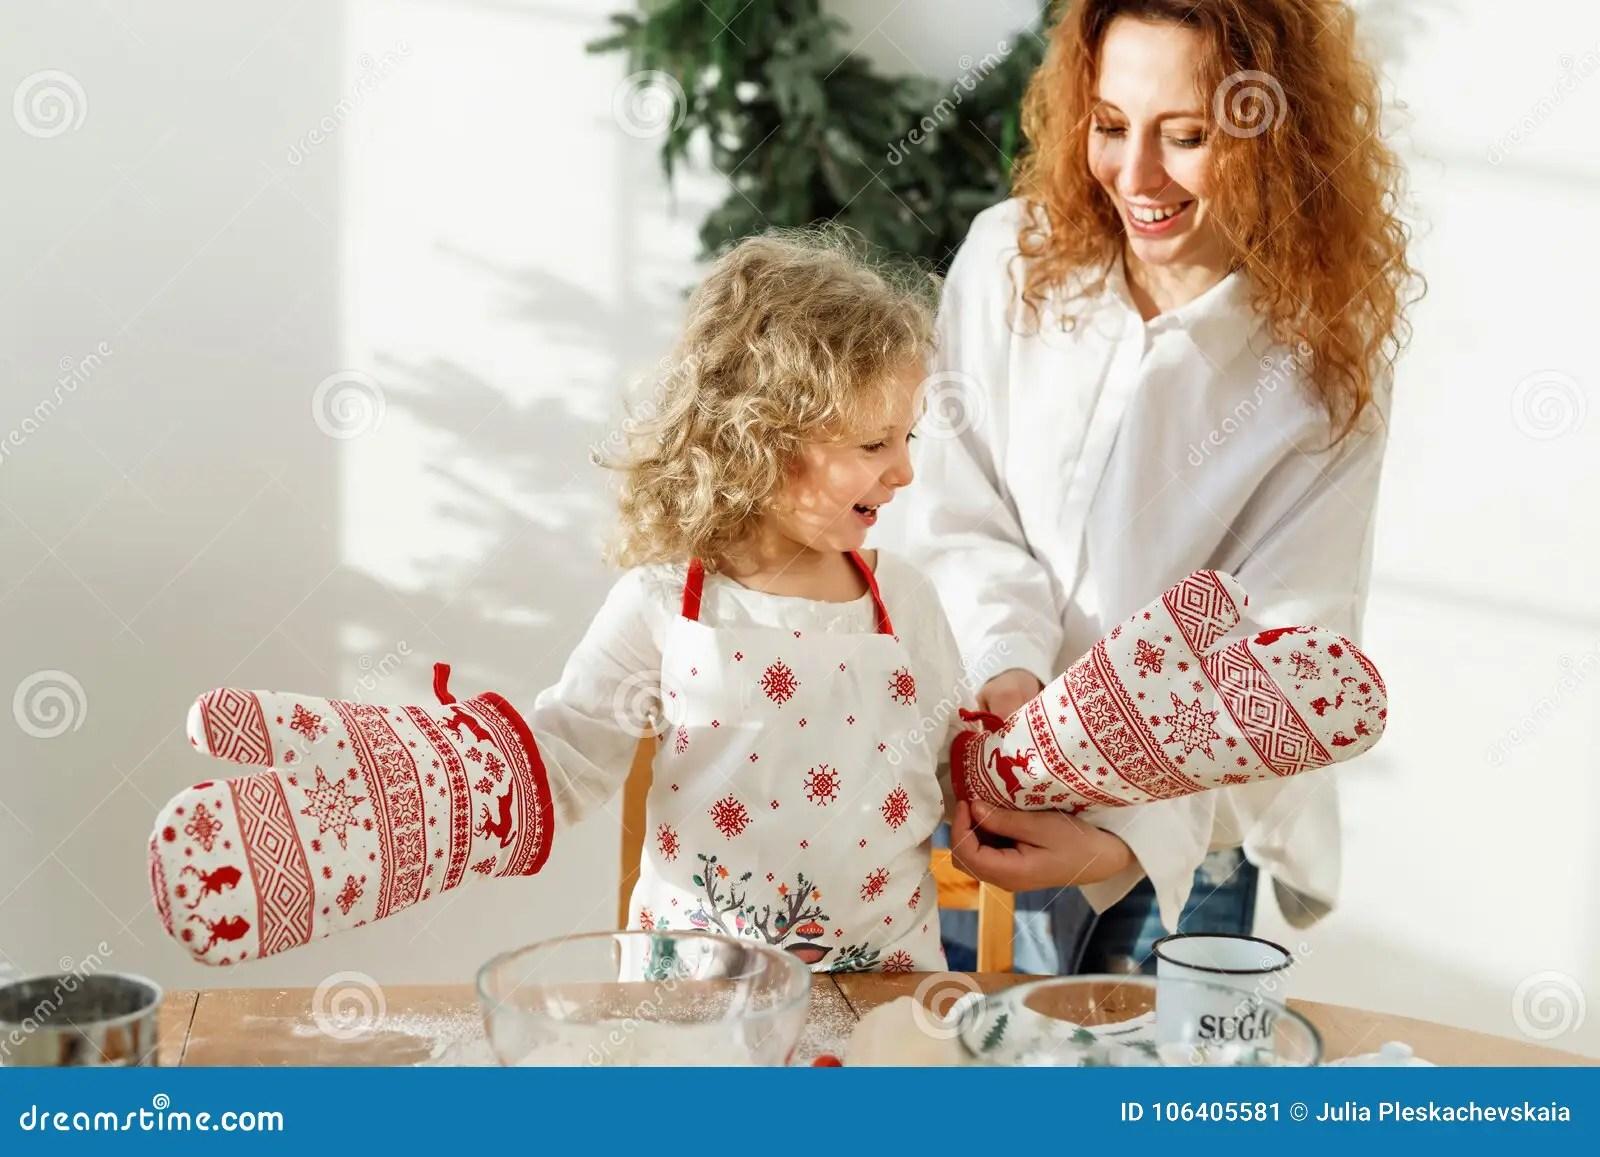 kitchen apron for kids outdoor cabinets kits 小坚硬工作的孩子戴着厨房手套 并且围裙 去帮助她的母亲厨师晚餐 有 去帮助她